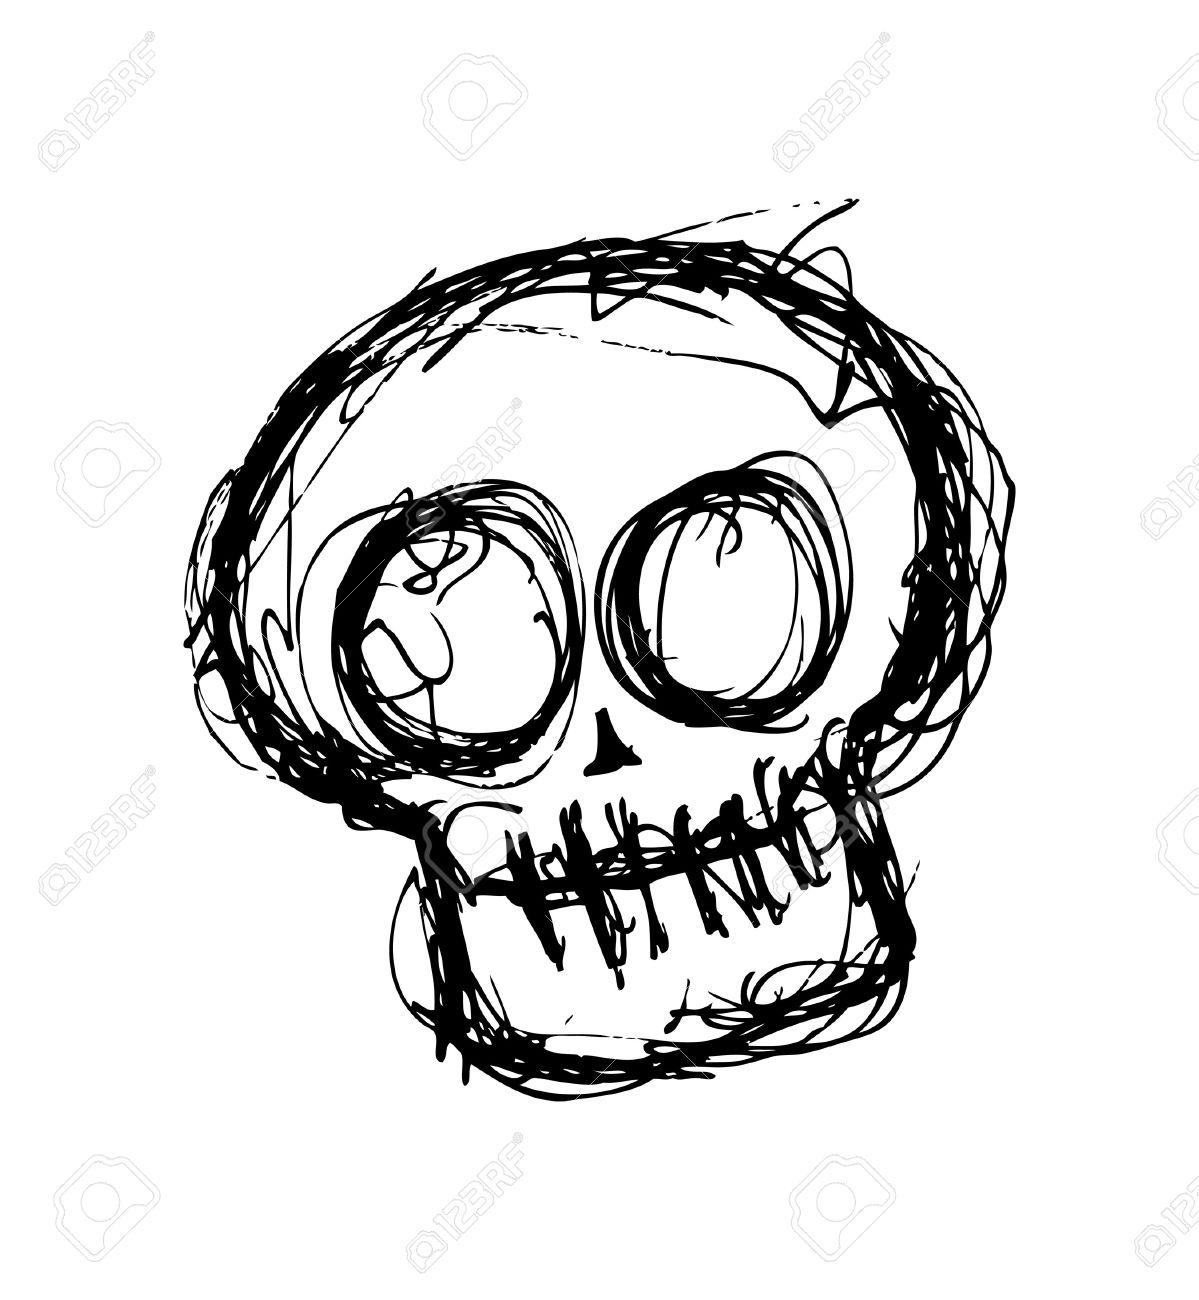 1199x1300 Drawn Hand Skull